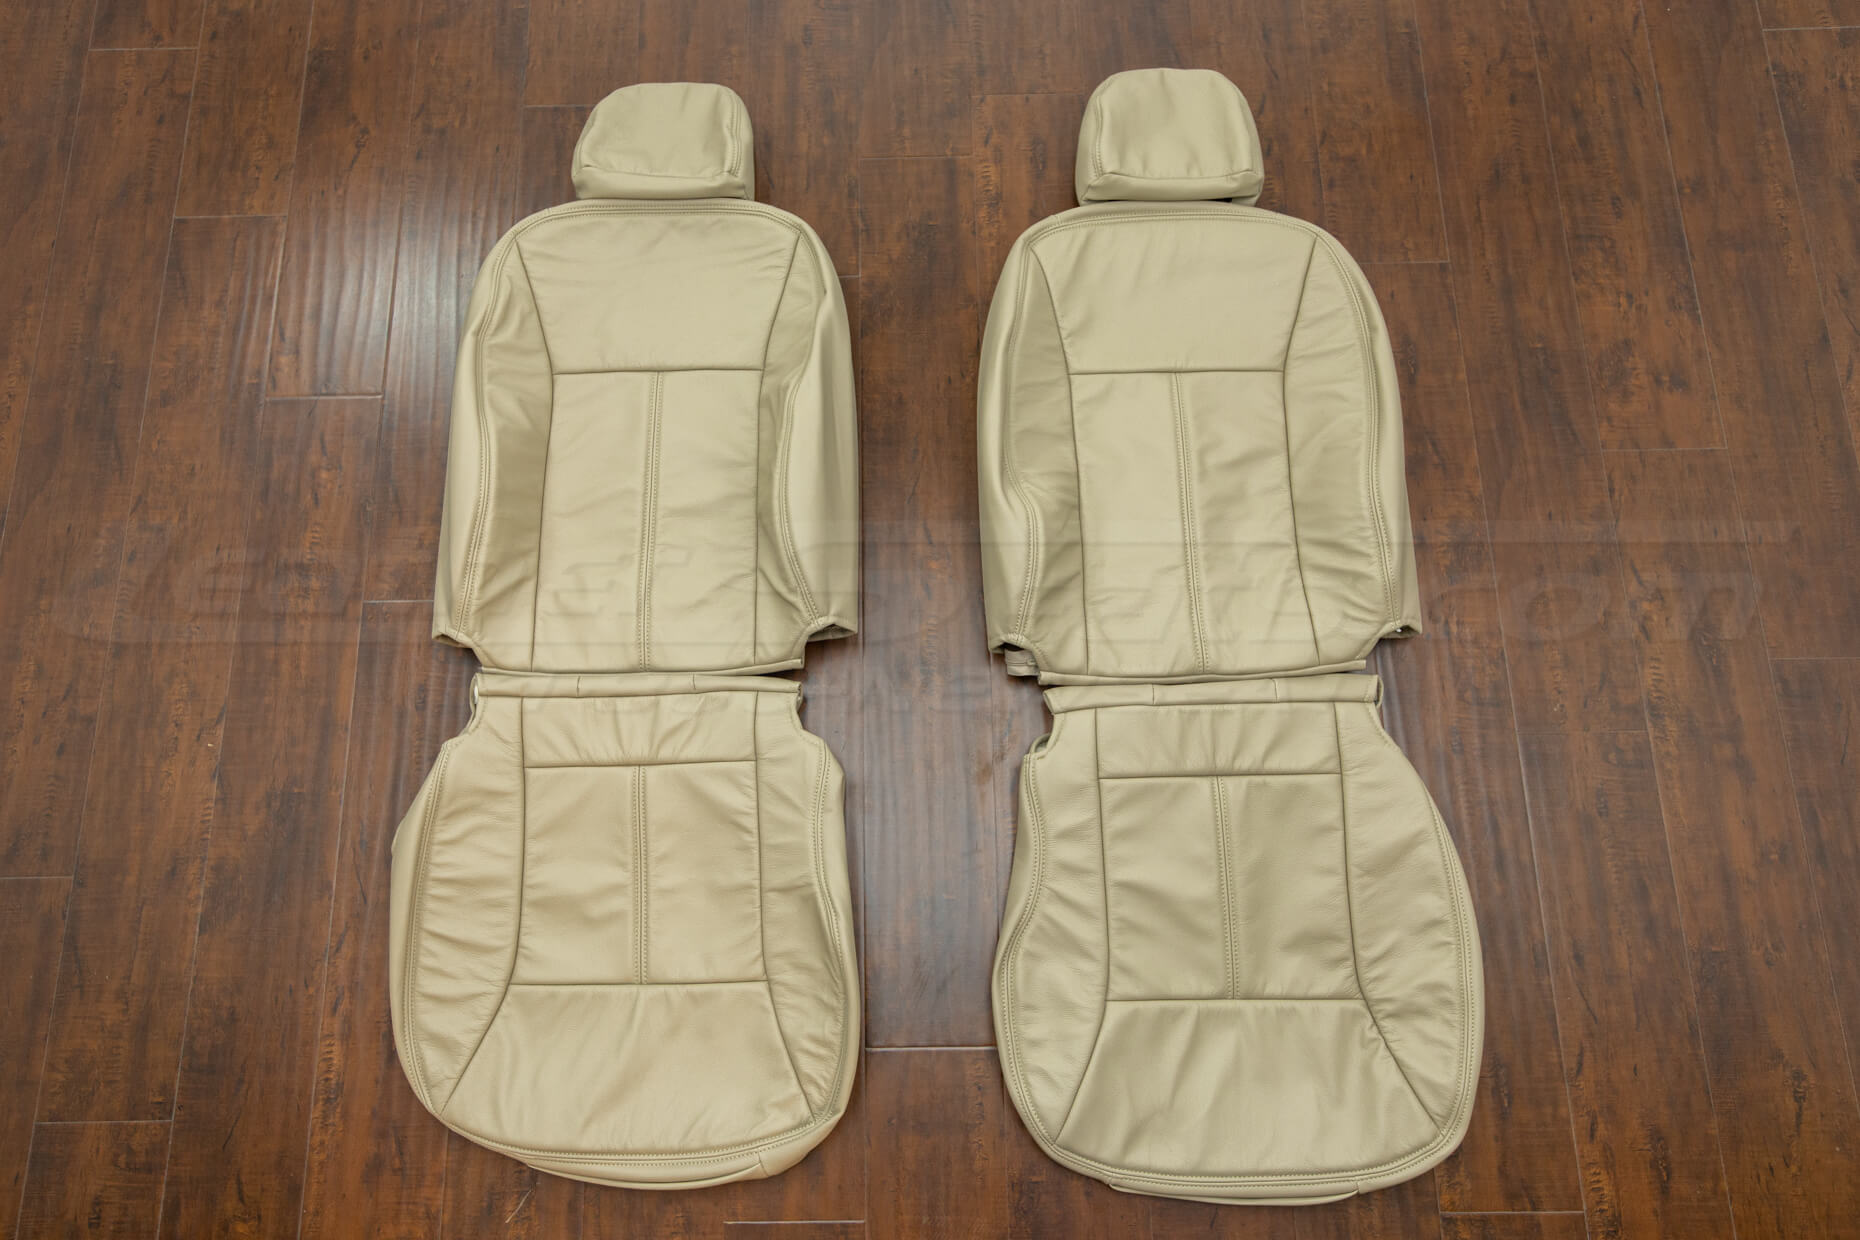 Chevrolet Impala Leather upholstery kit sandstone - fronts